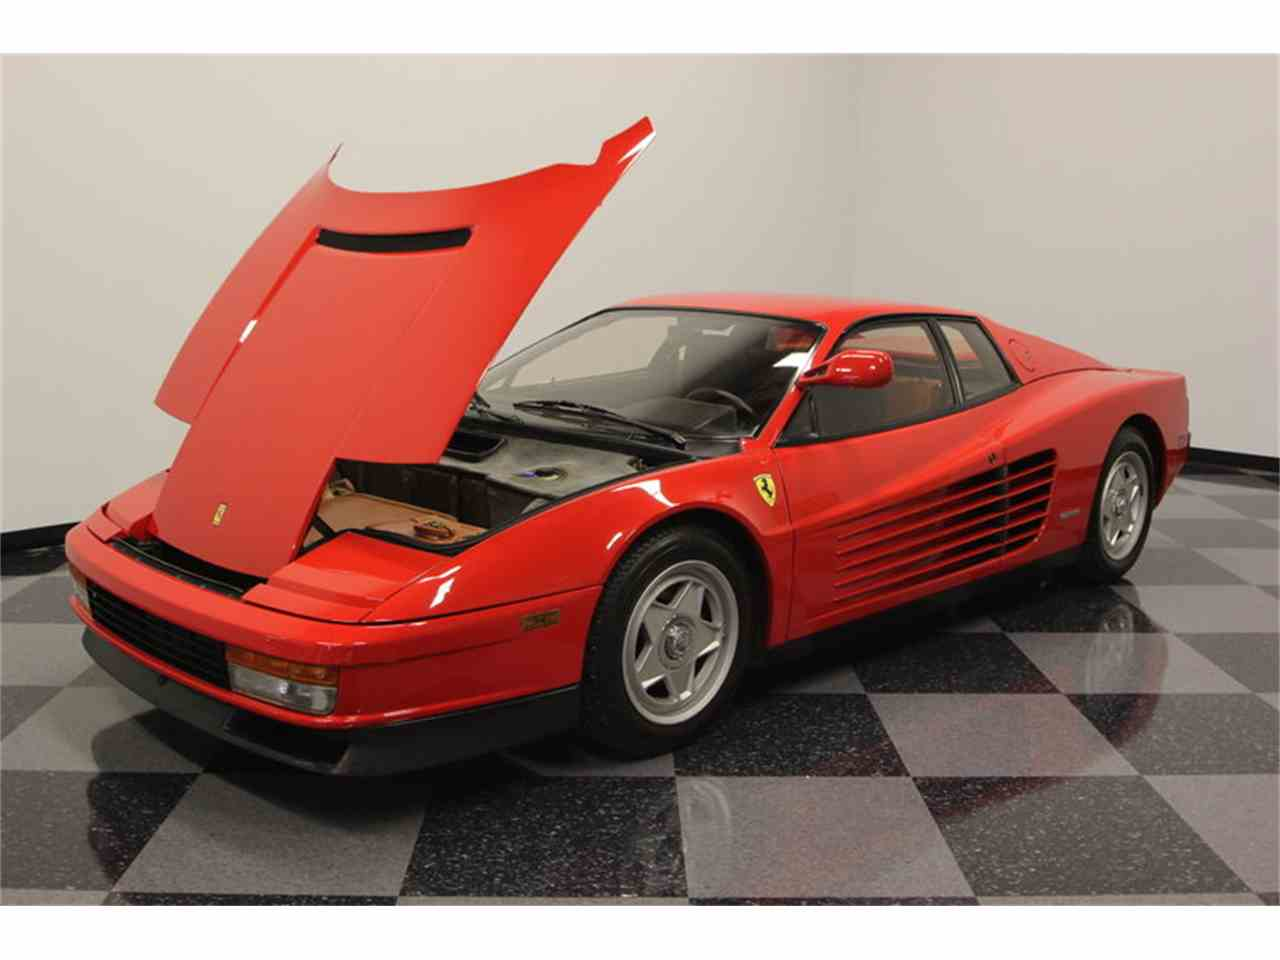 Large Picture of '86 Ferrari Testarossa located in Florida - FNNC